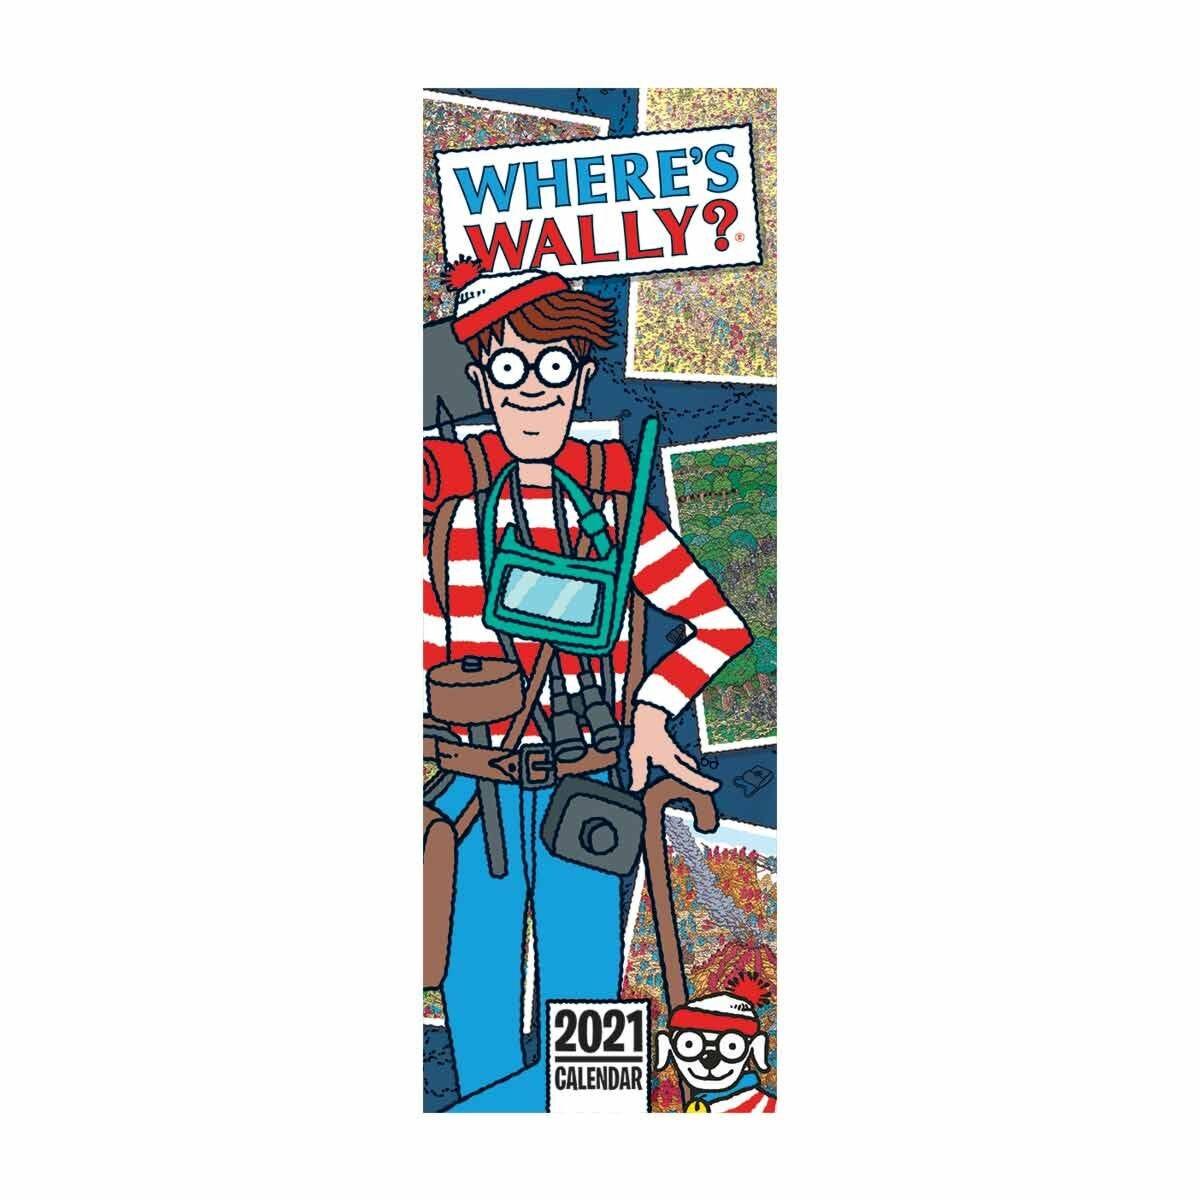 Wheres Wally Slim Calendar 2021